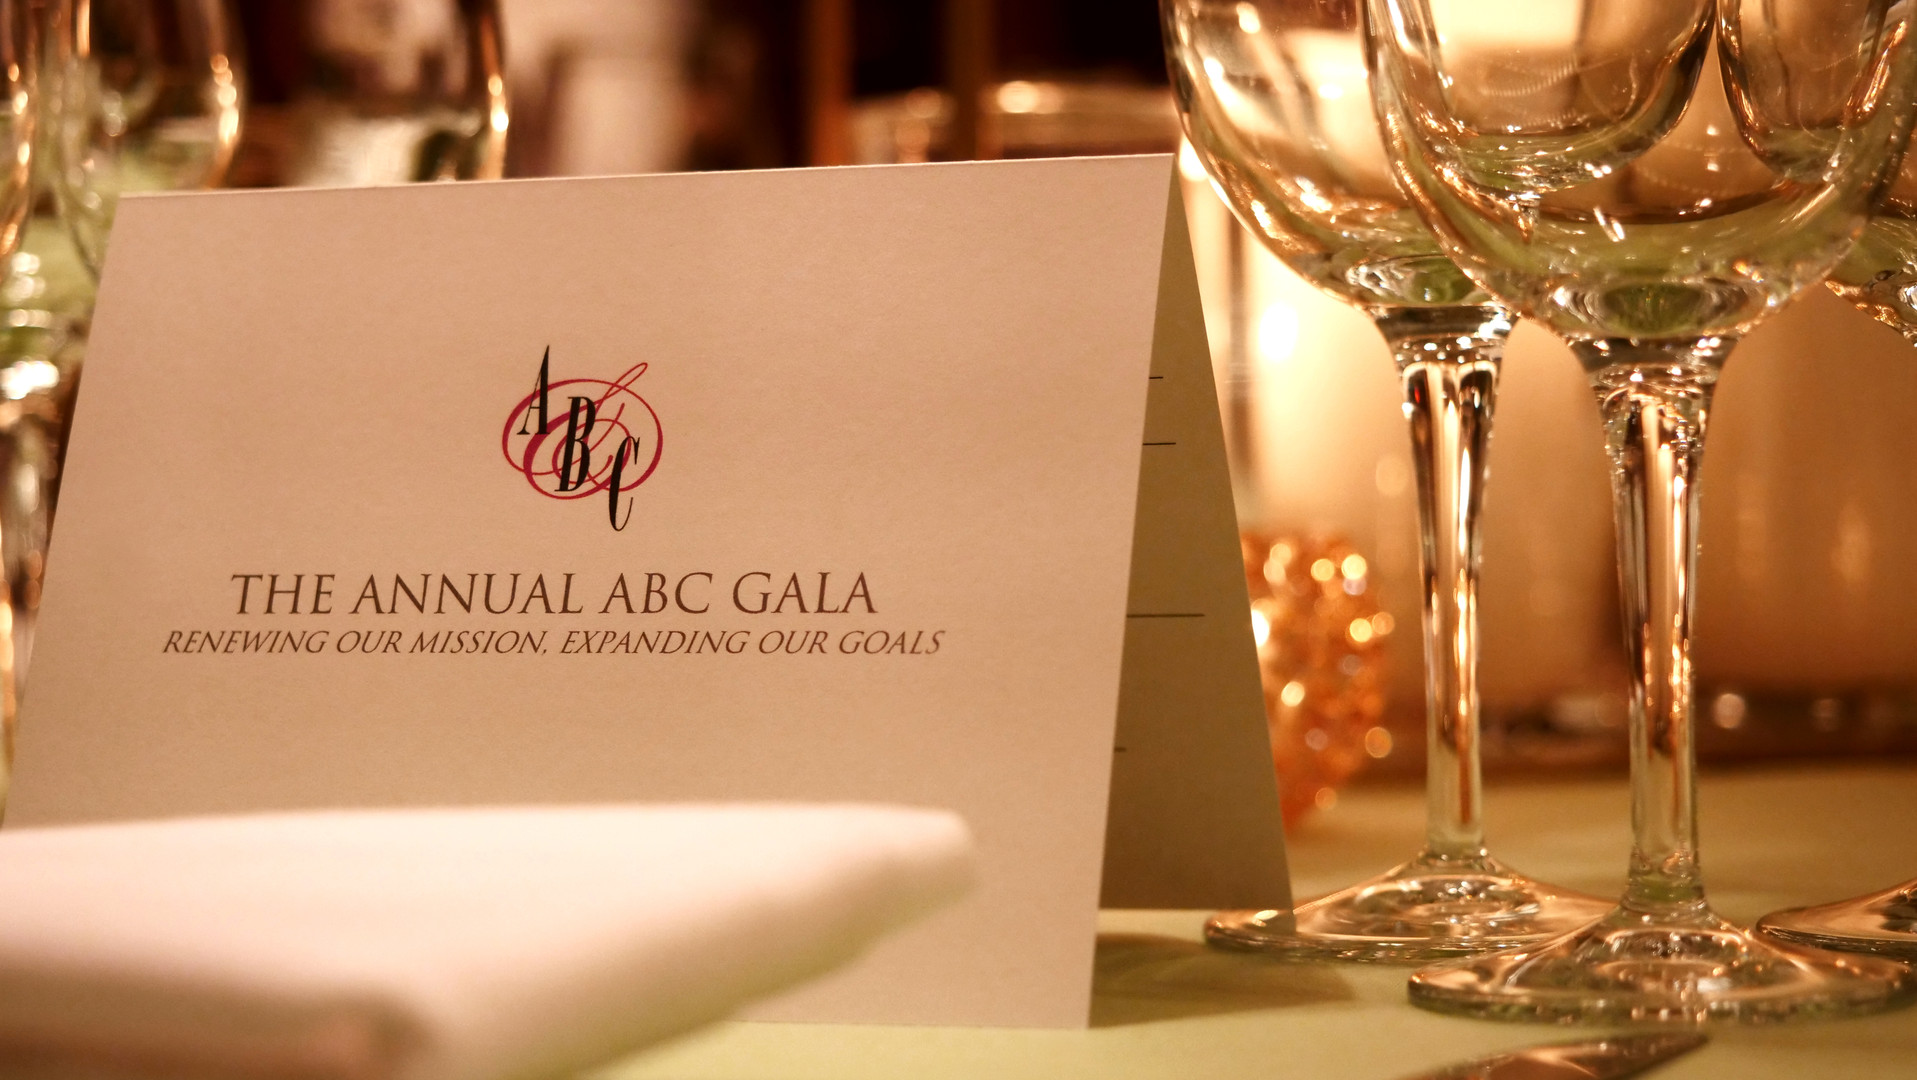 ABC Gala